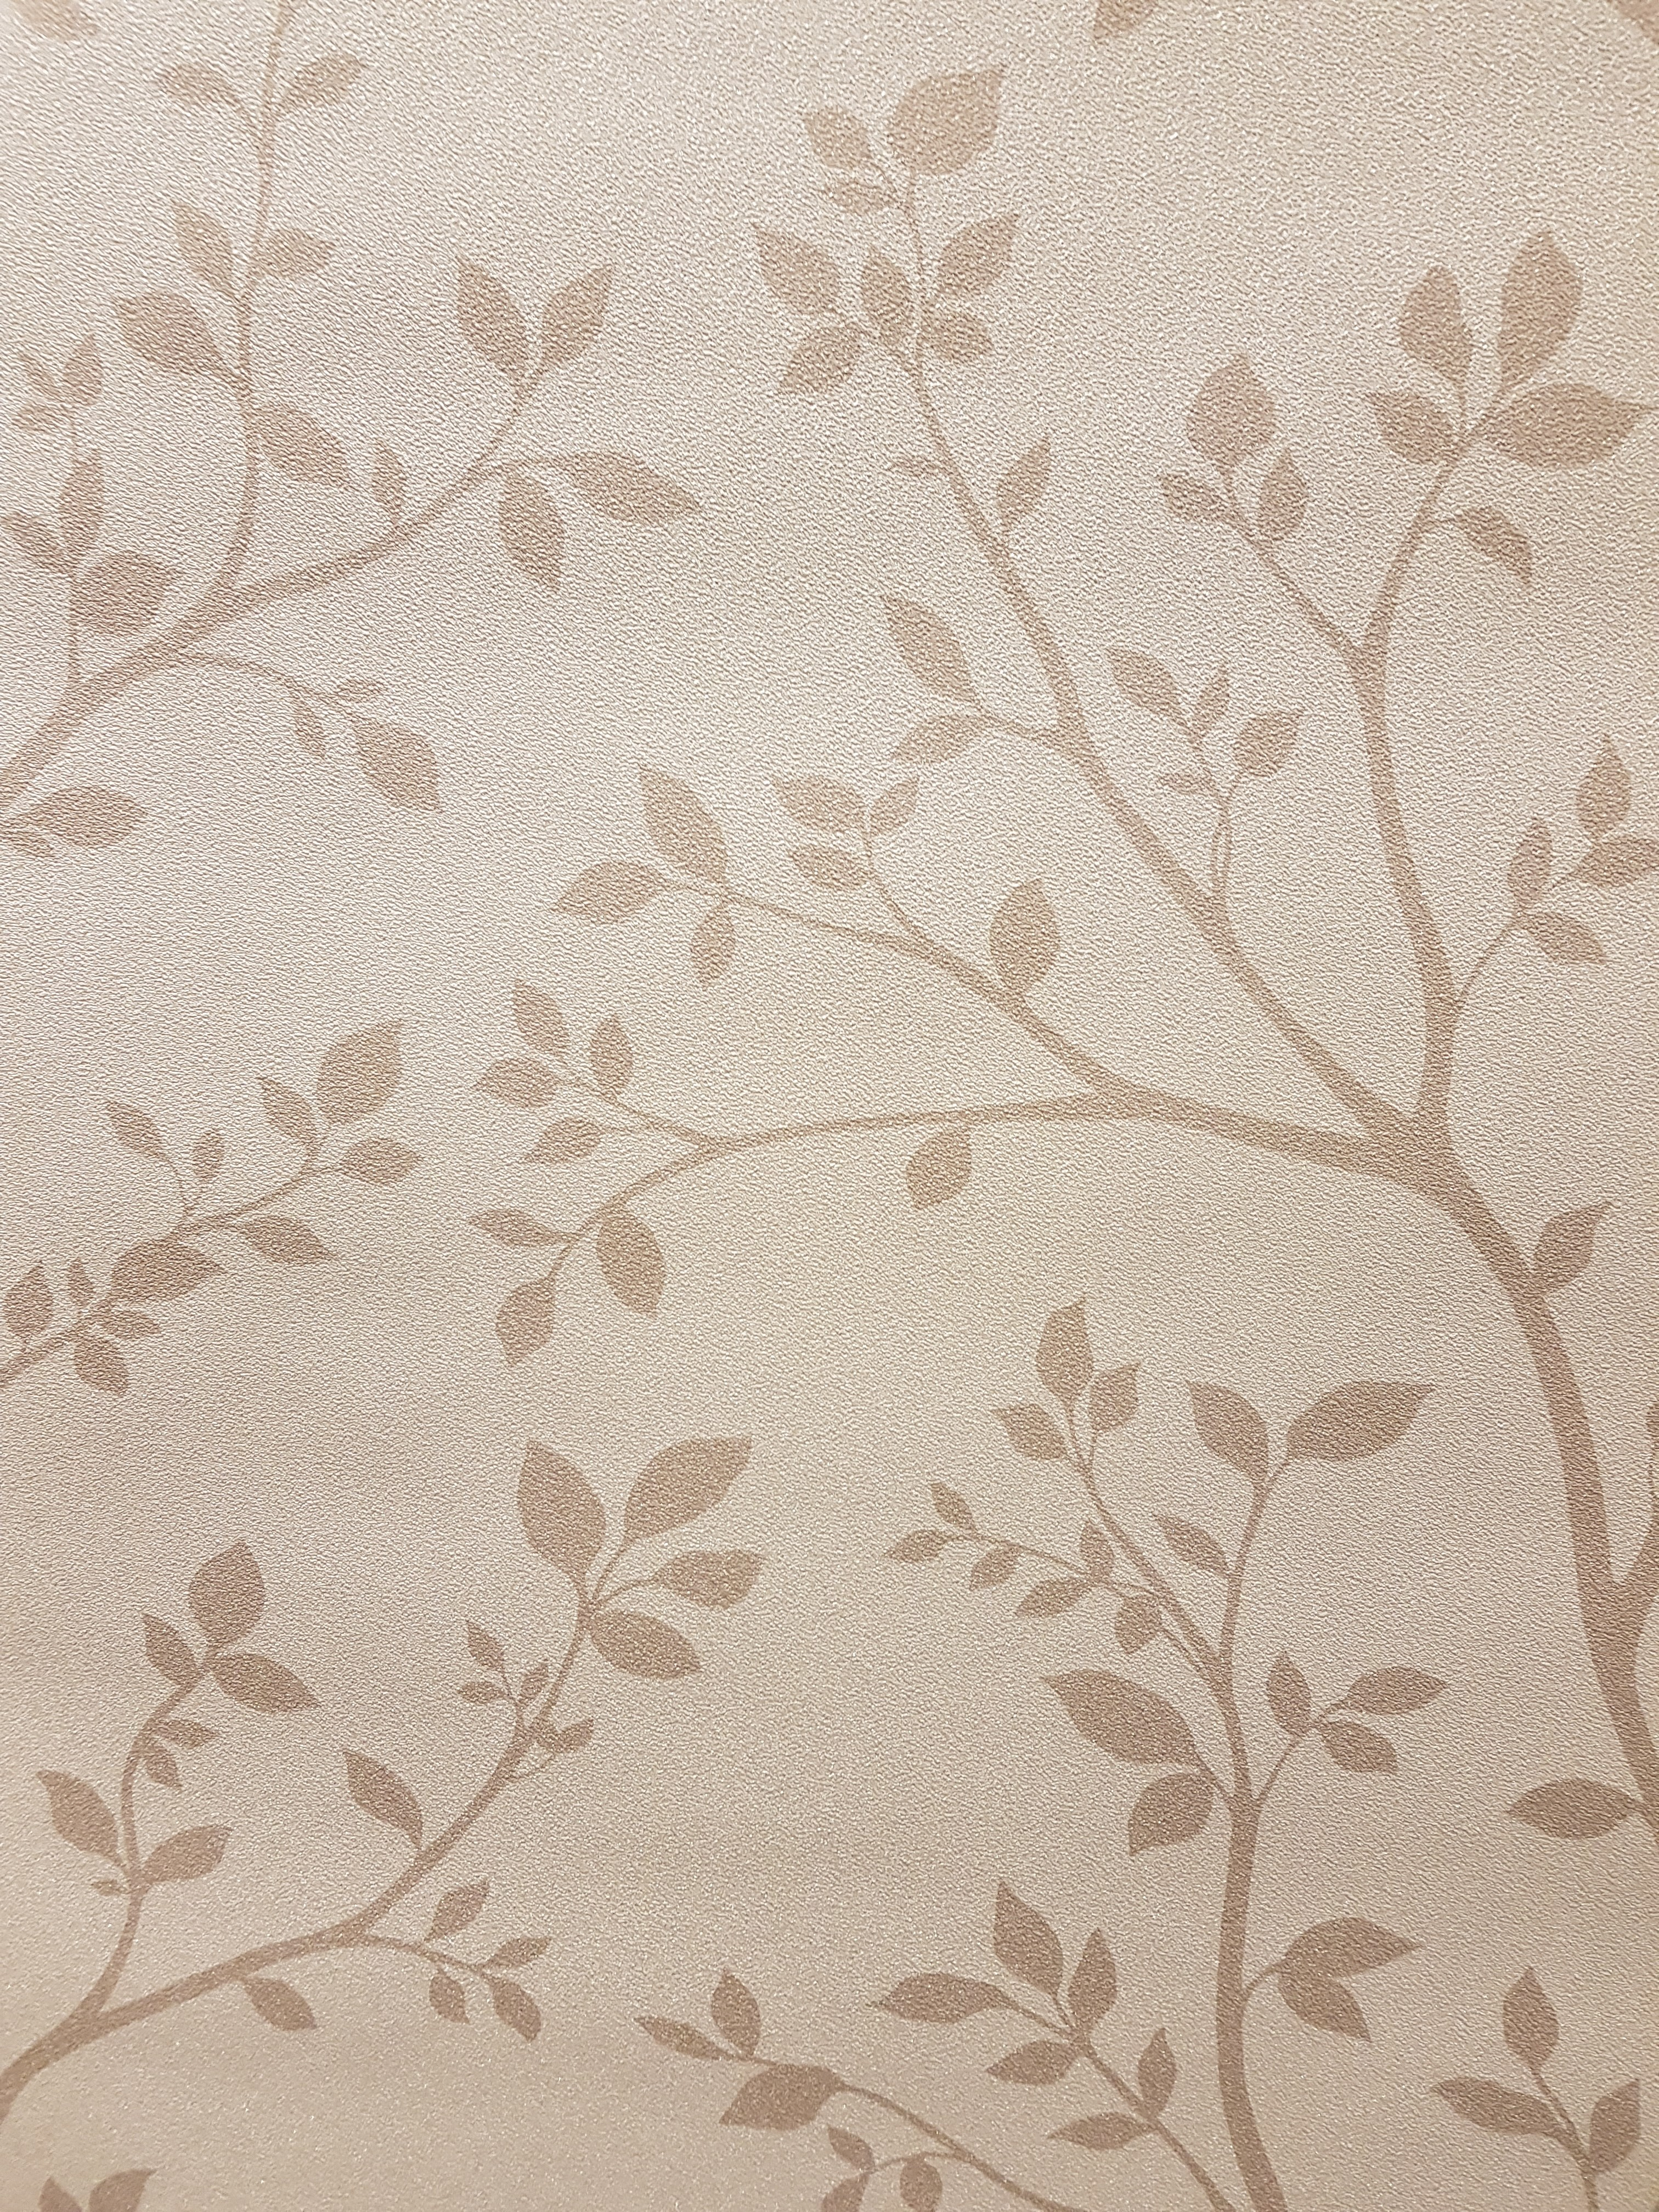 Grandeco Reflect Leaf Trail Vinyl Wallpaper RE2305 Beige